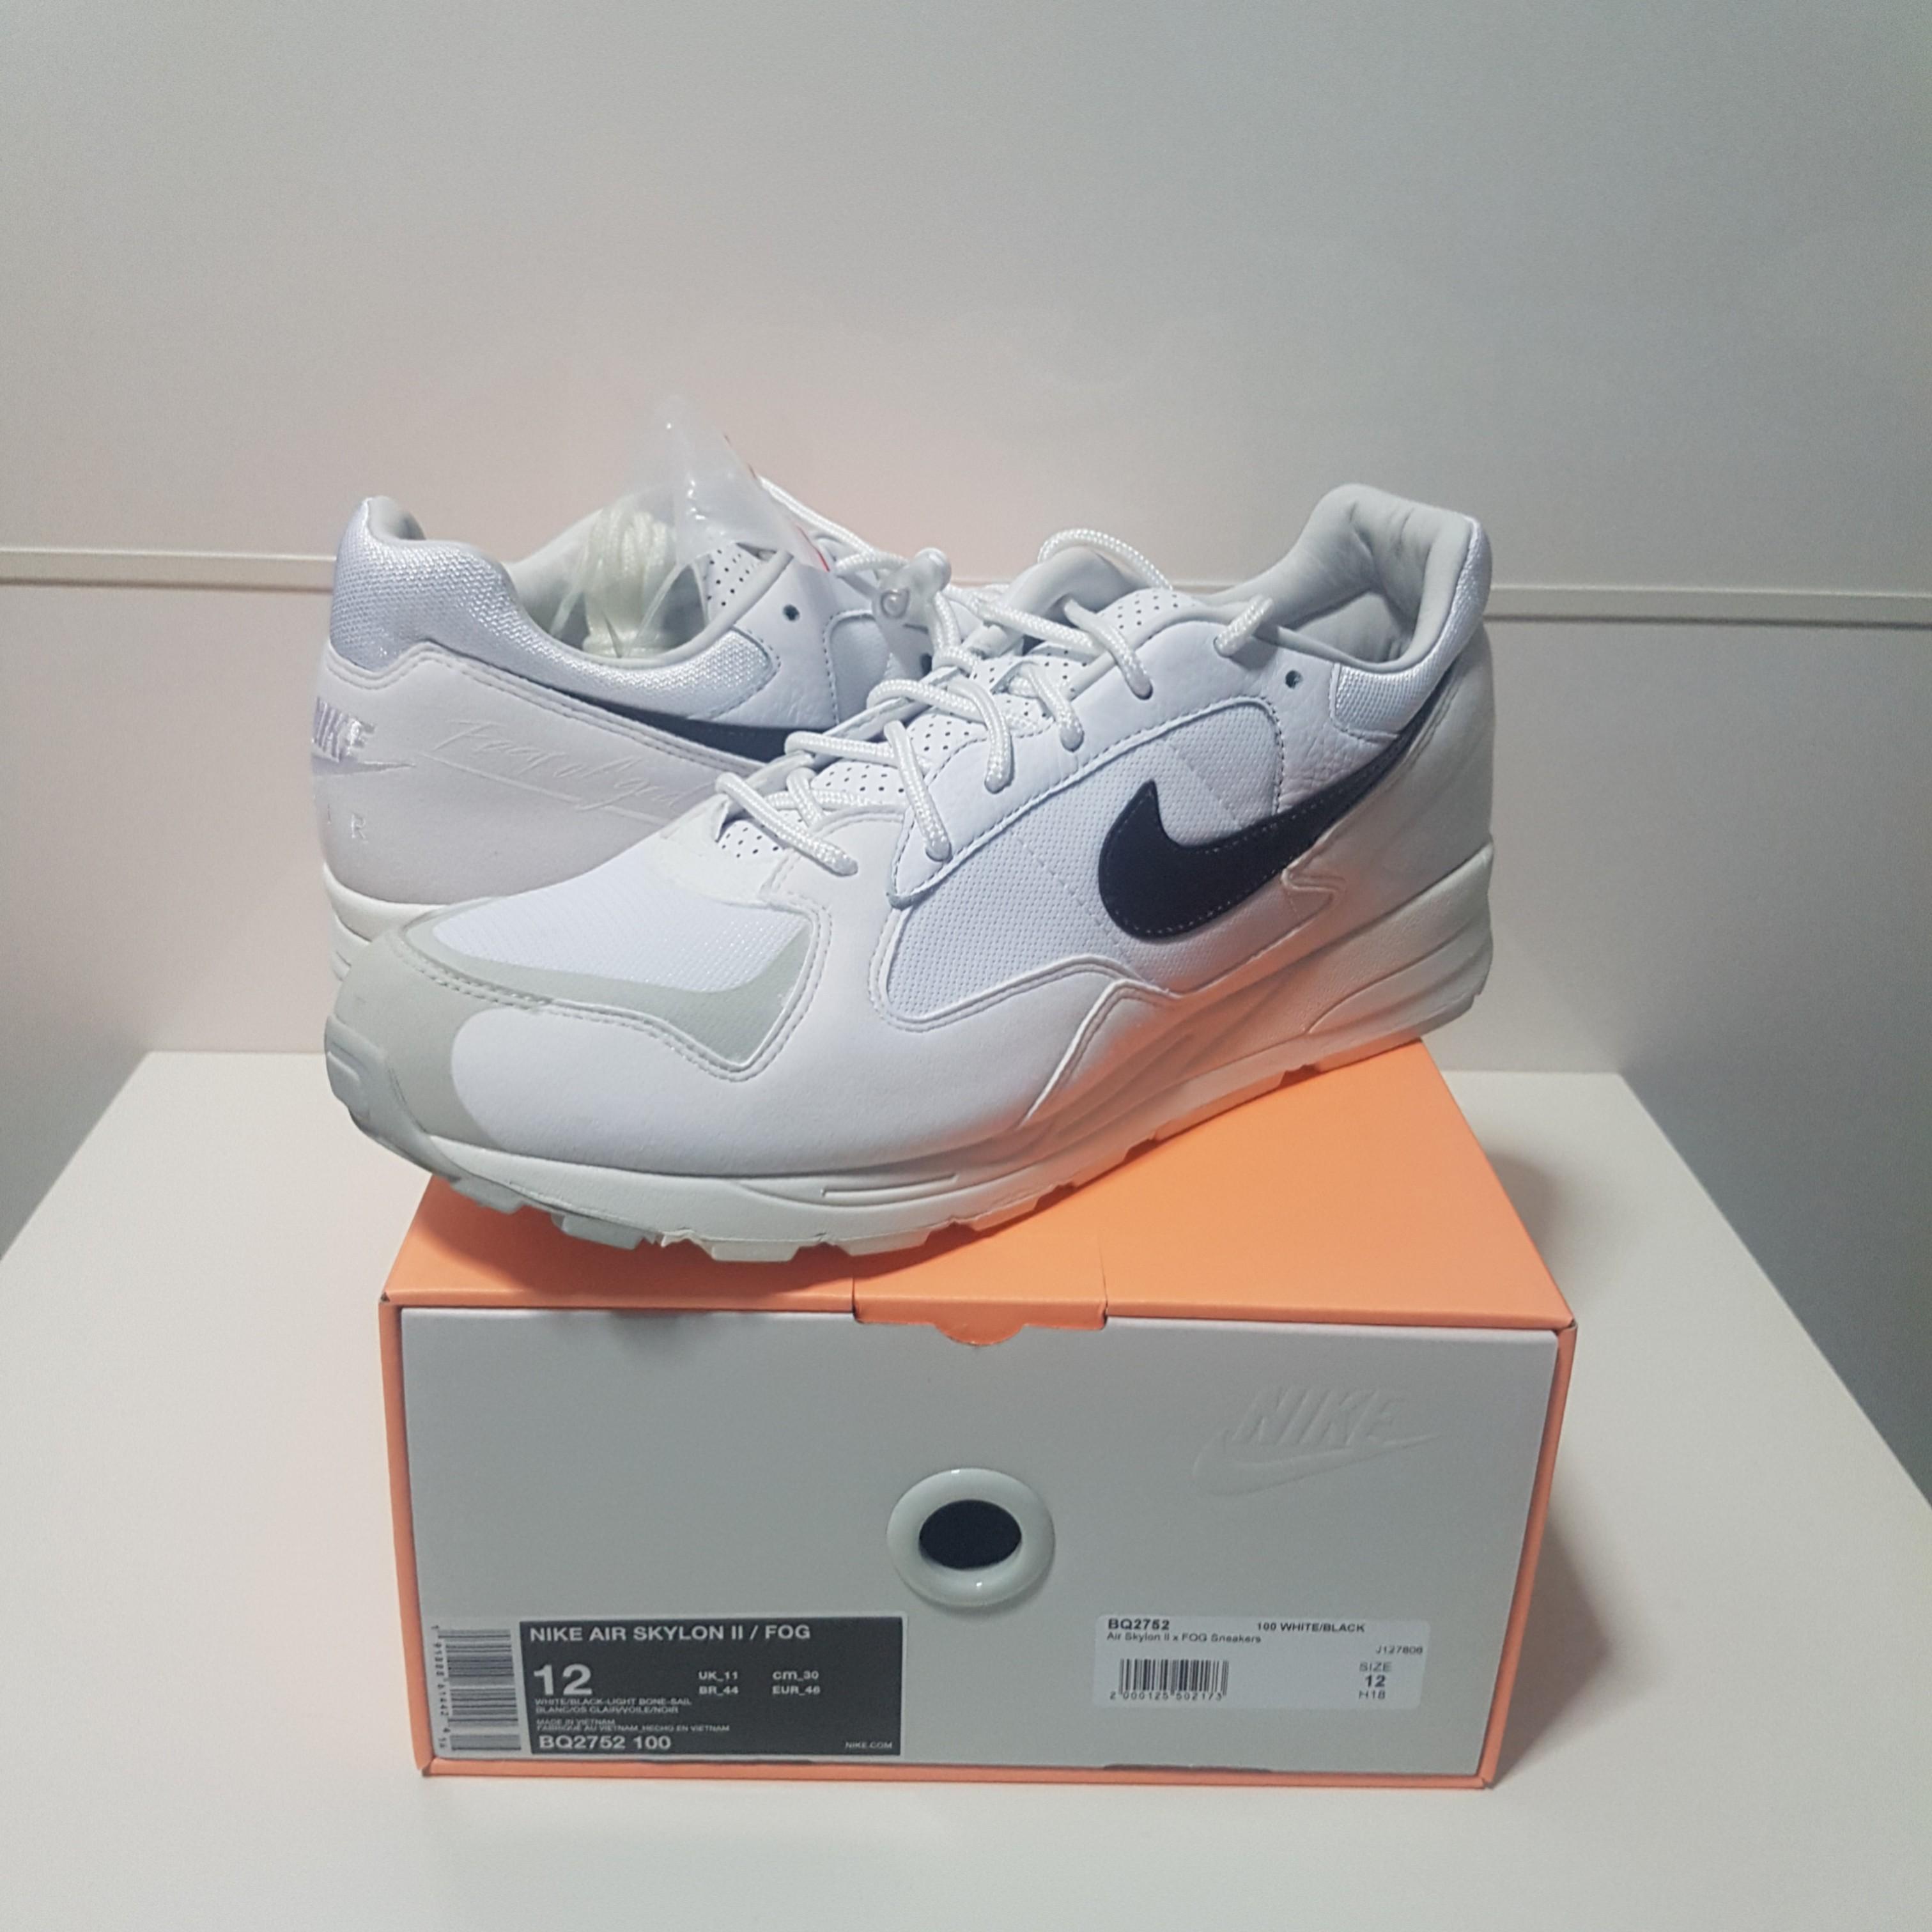 low priced a7618 cca80 Fear Of God x Nike Air Skylon II (W), Men s Fashion, Footwear, Sneakers on  Carousell